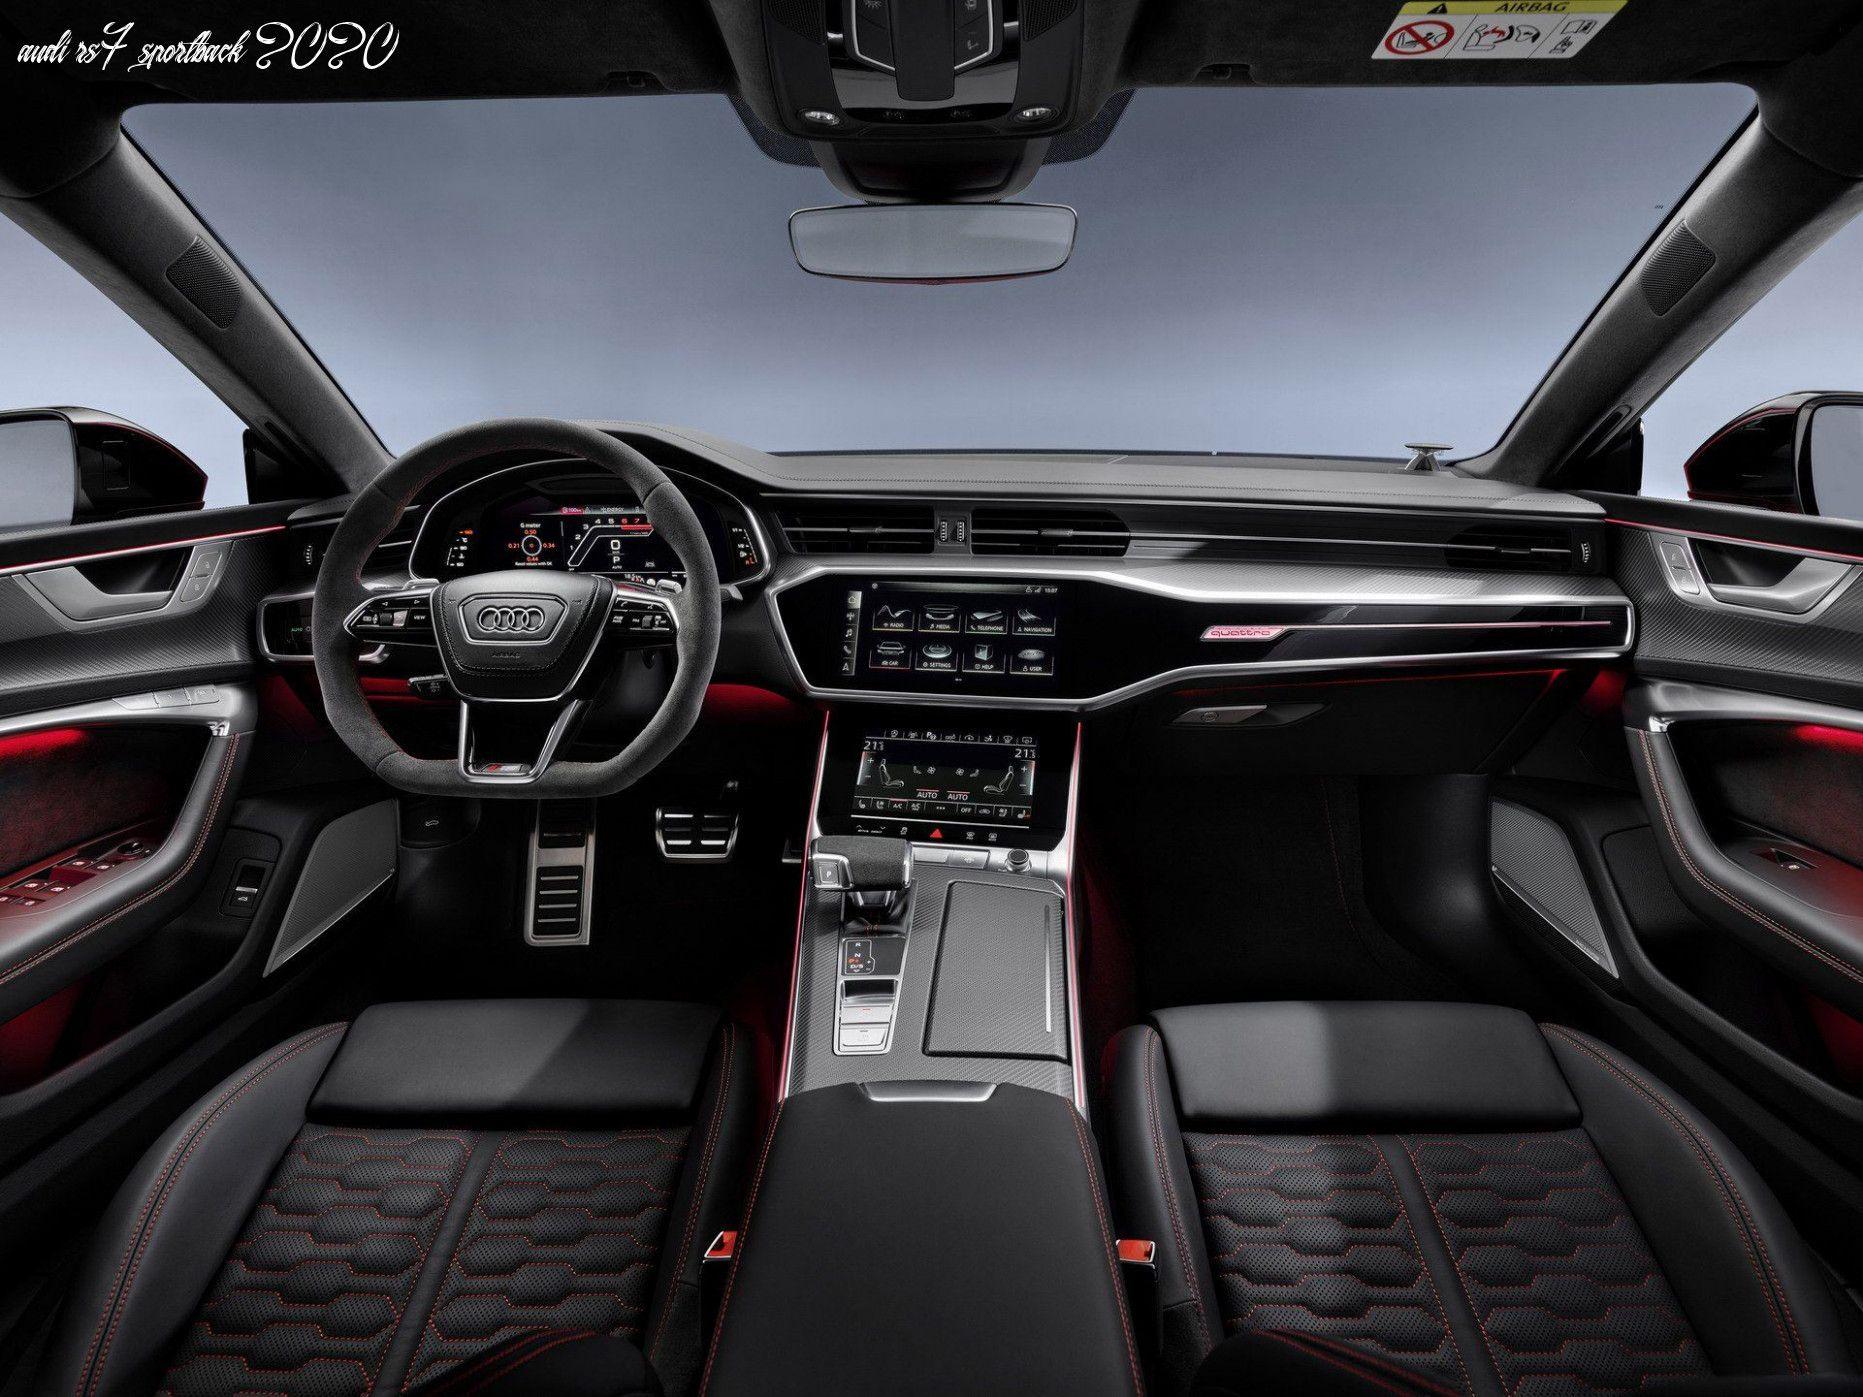 Audi Rs7 Sportback 2020 In 2020 Audi Rs Audi Rs7 Sportback Rs7 Sportback